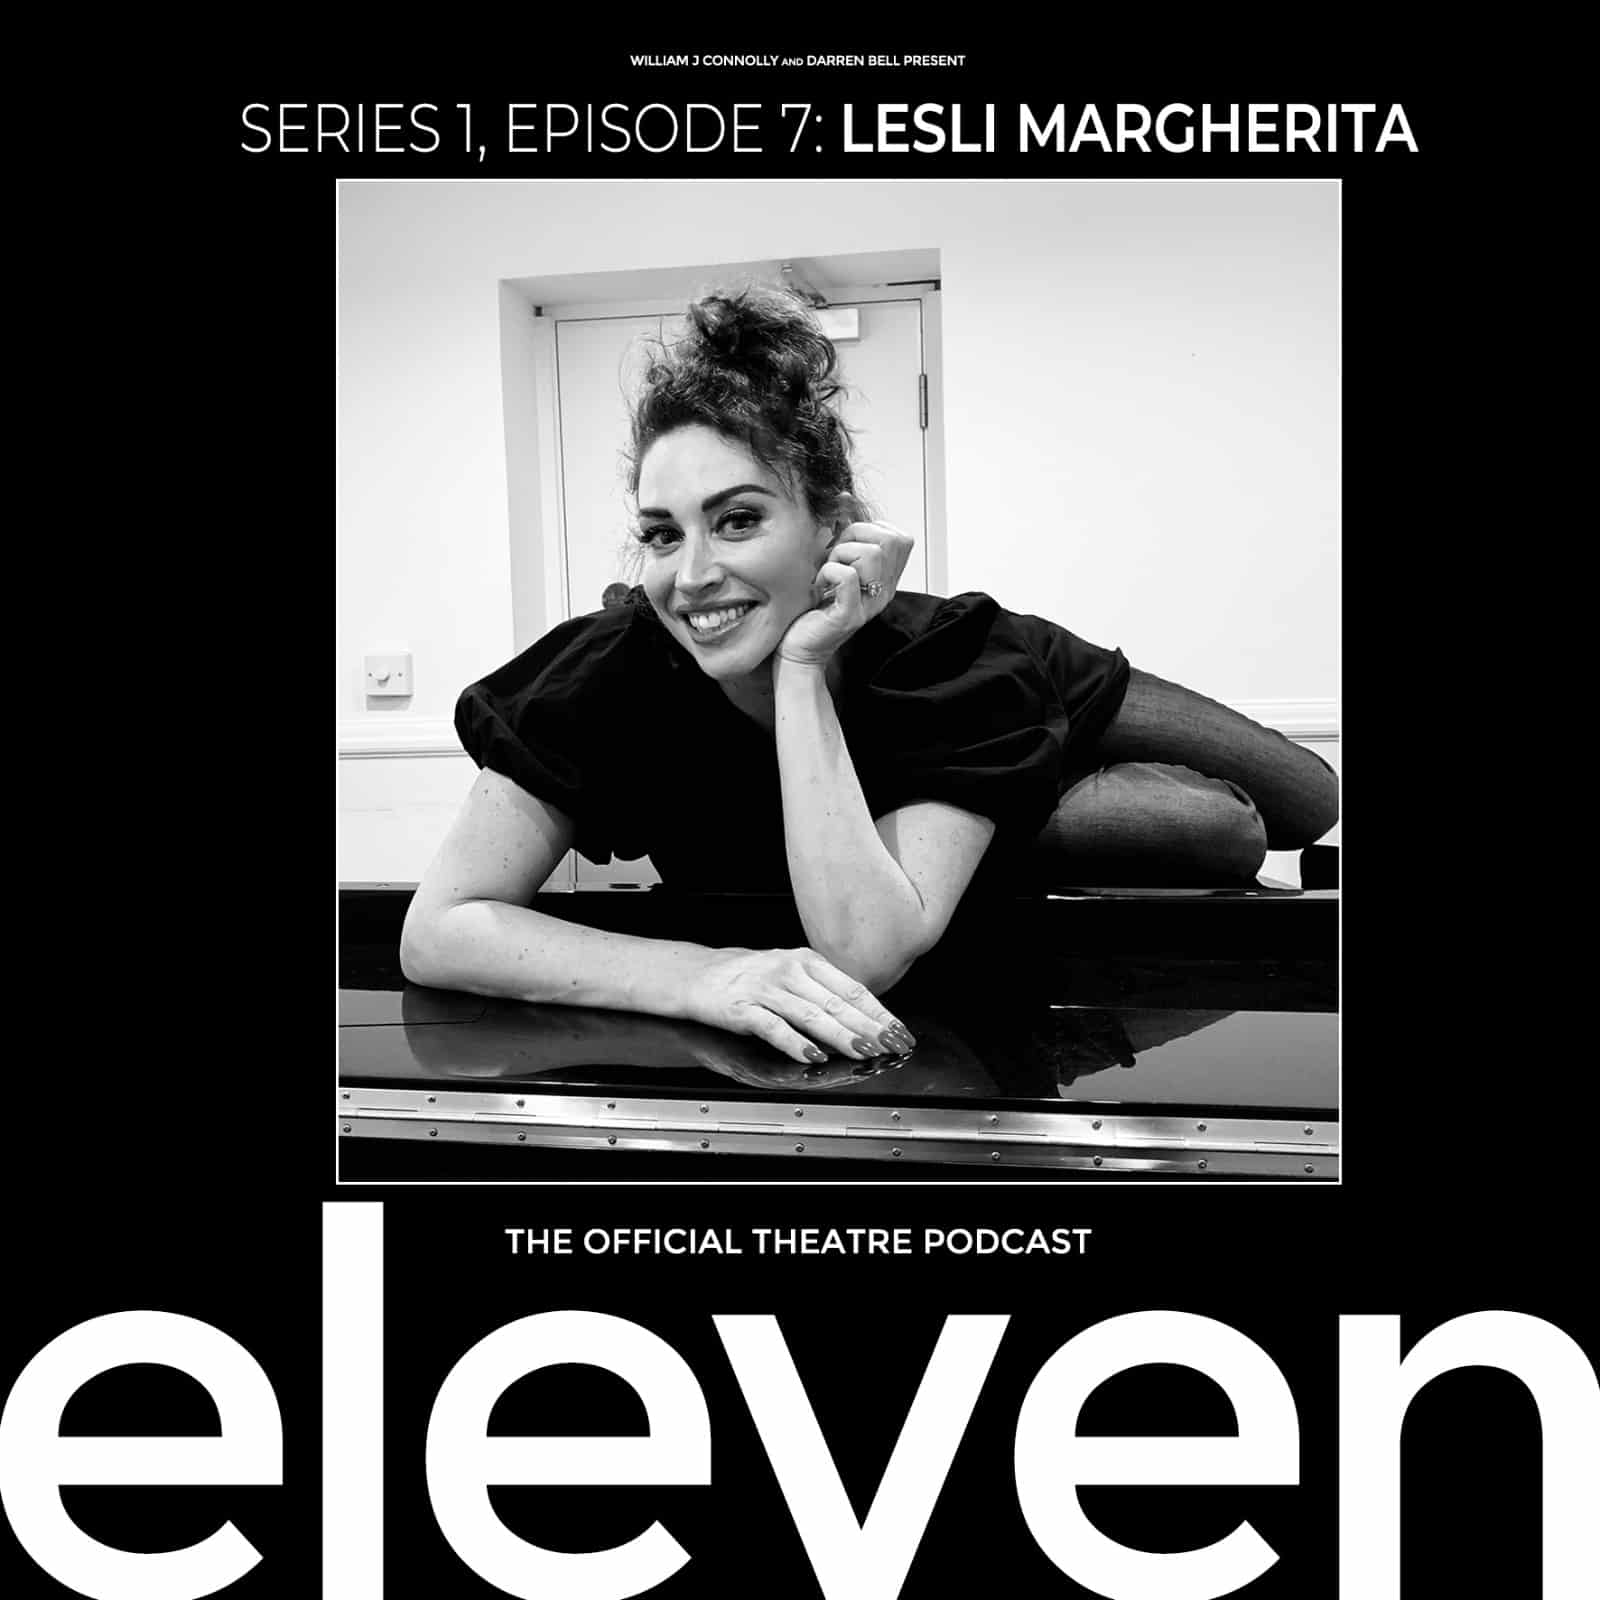 eleven ep7 Lesli Margherita